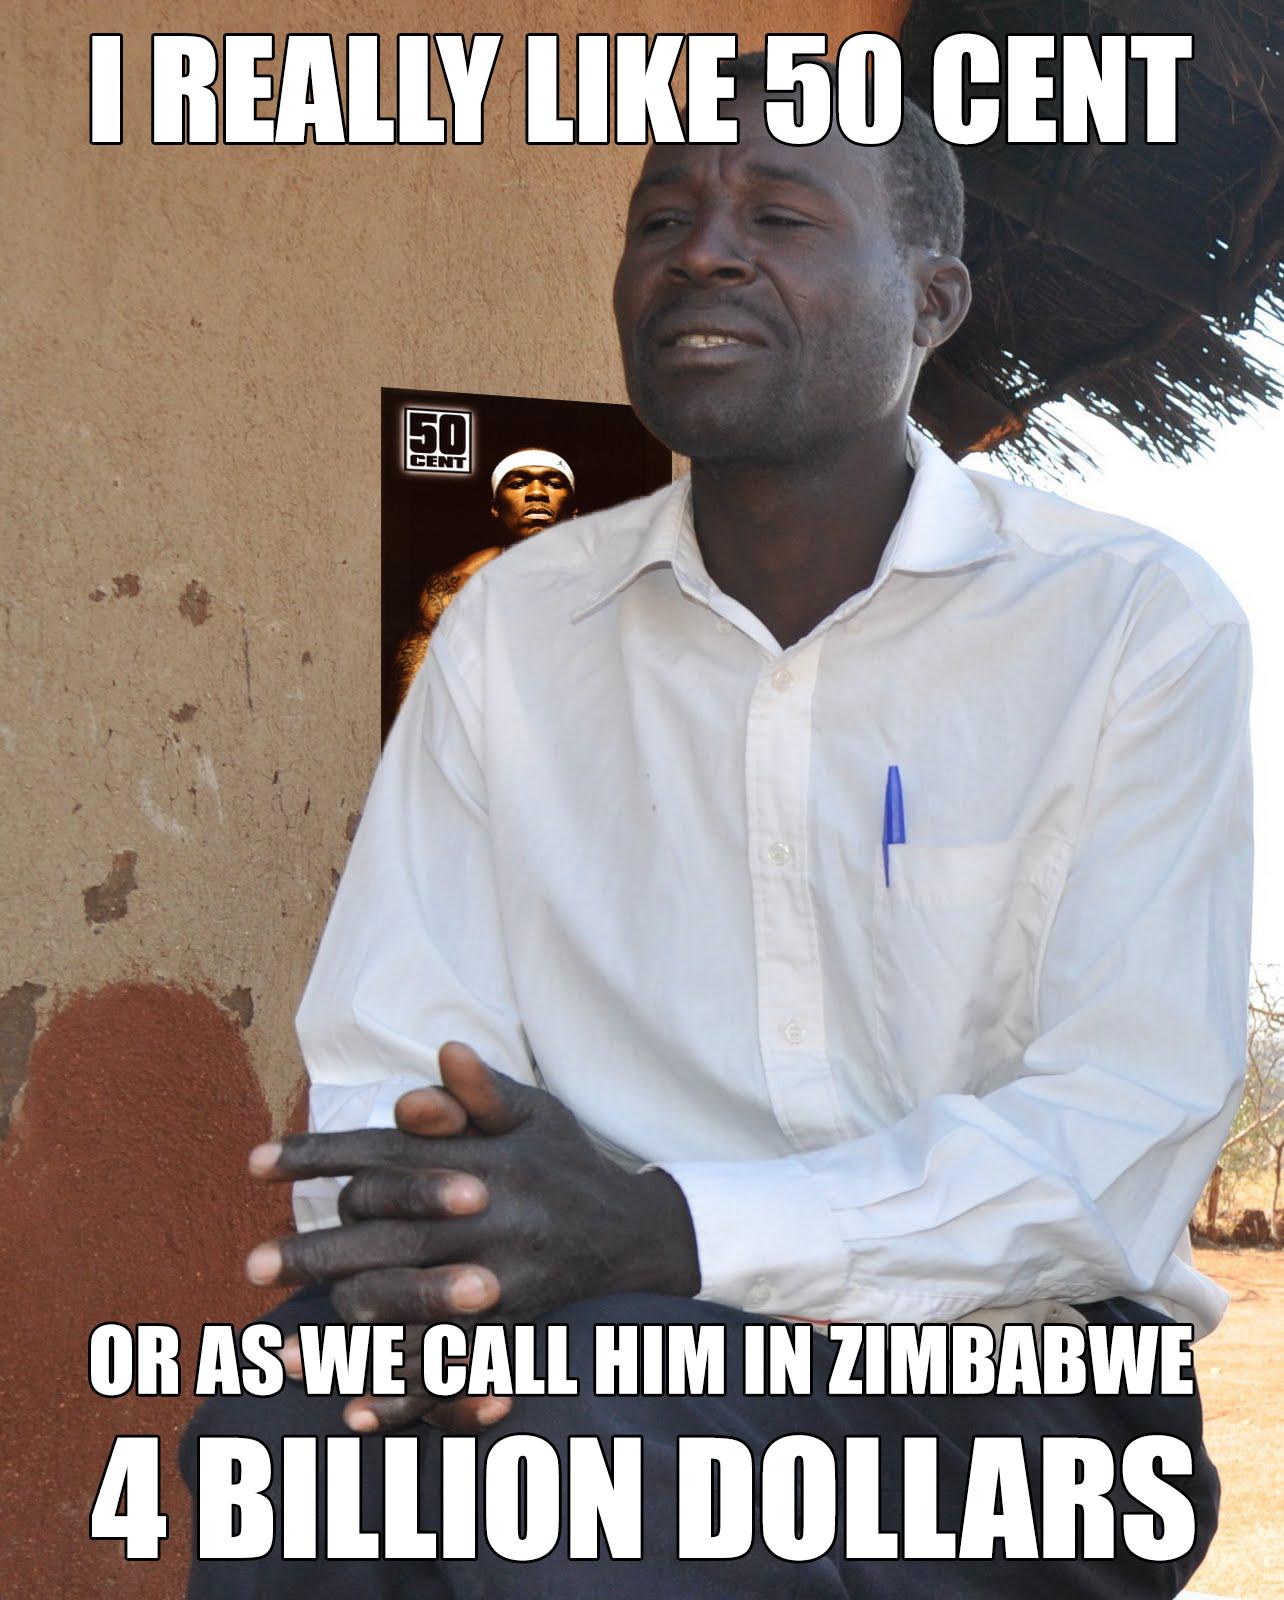 Quotes 50 Cent Or As We Call Him In Zimbabwe. Boredom  Pinterest  Zimbabwe